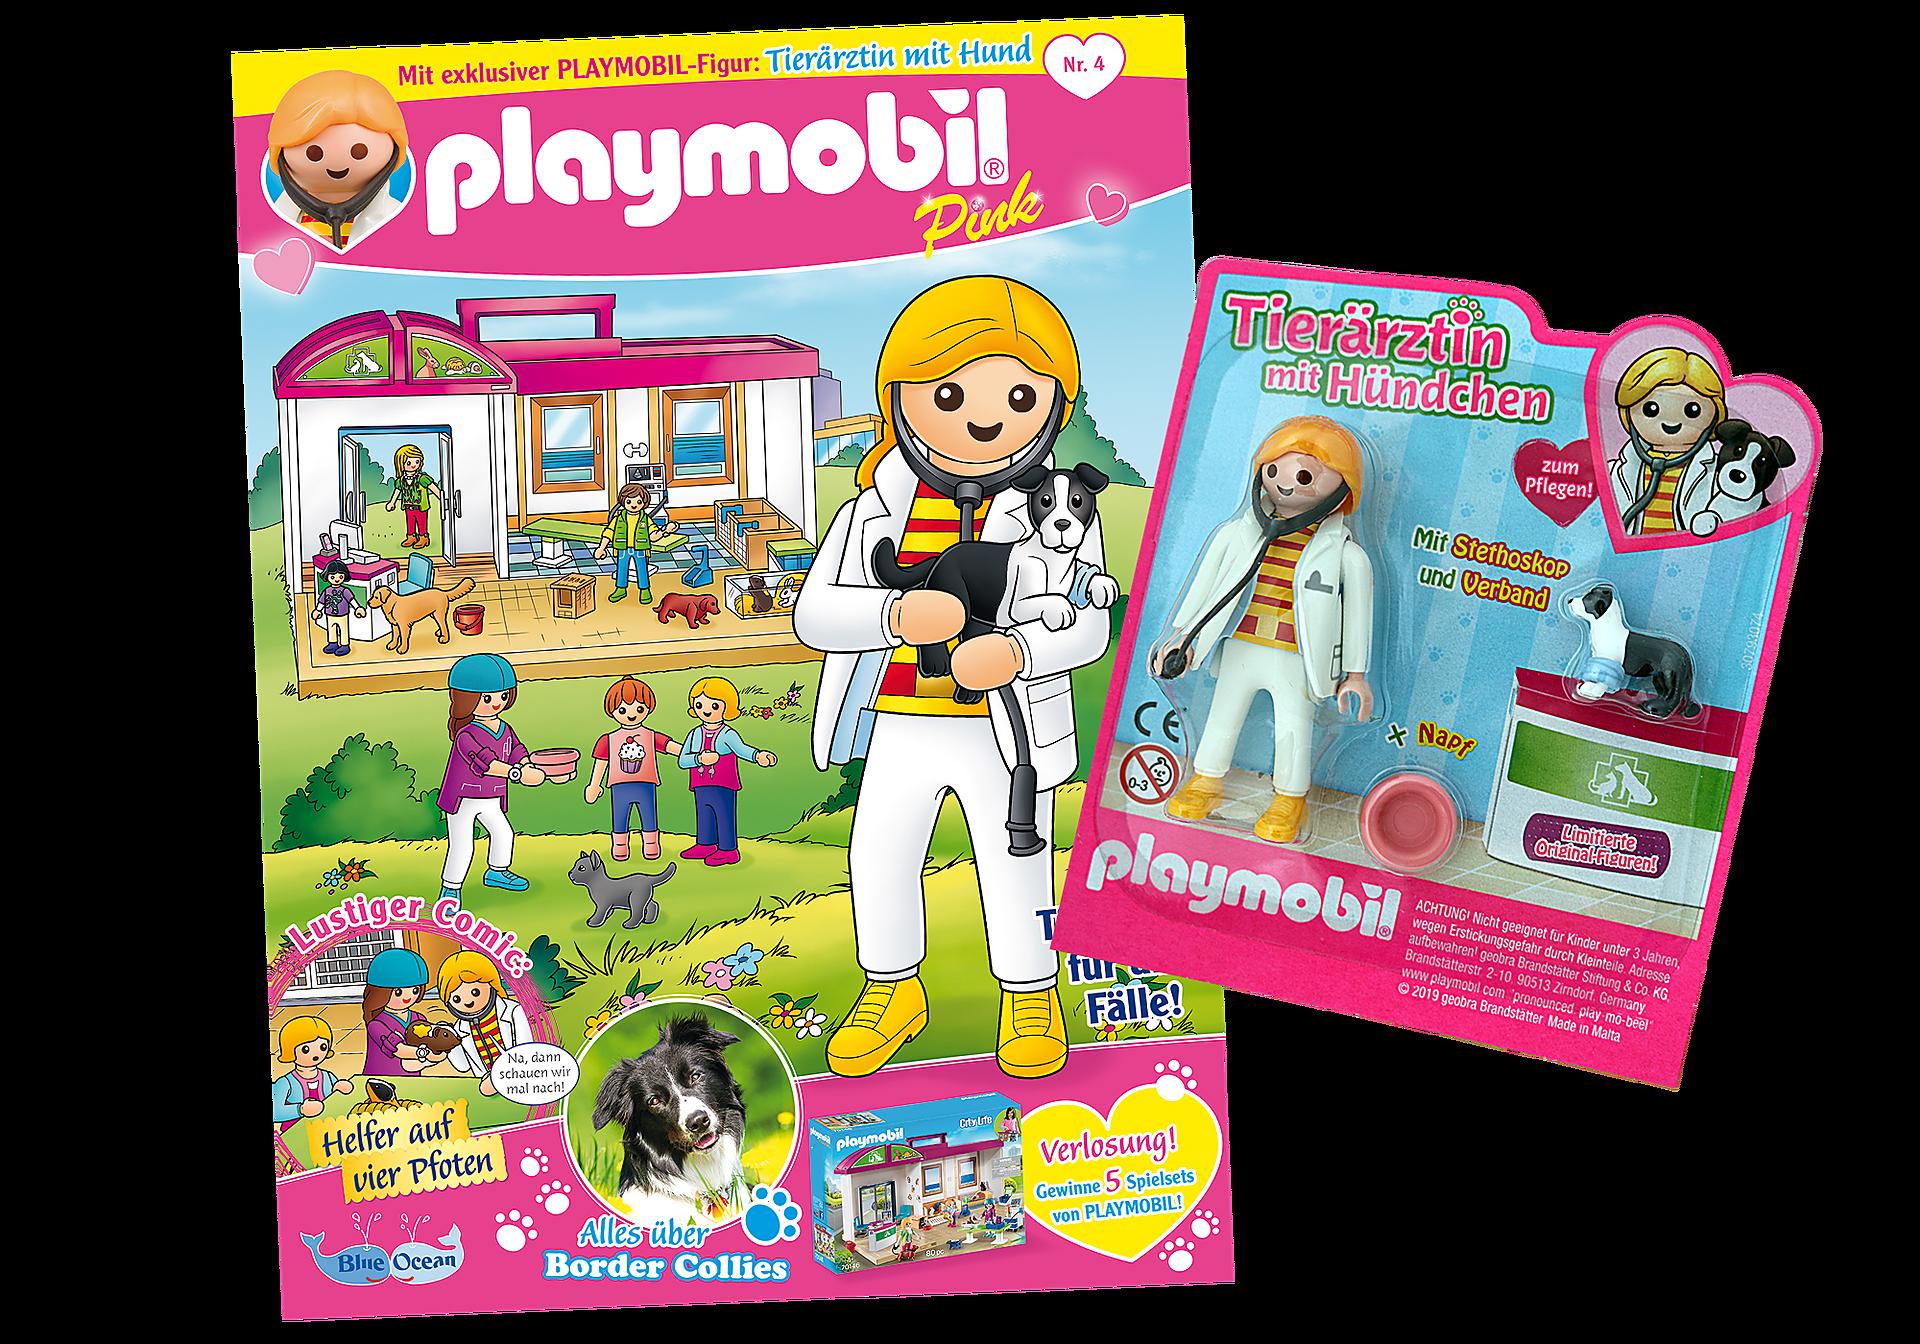 80627 PLAYMOBIL-Magazin Pink 4/2019 (Heft 44) zoom image1